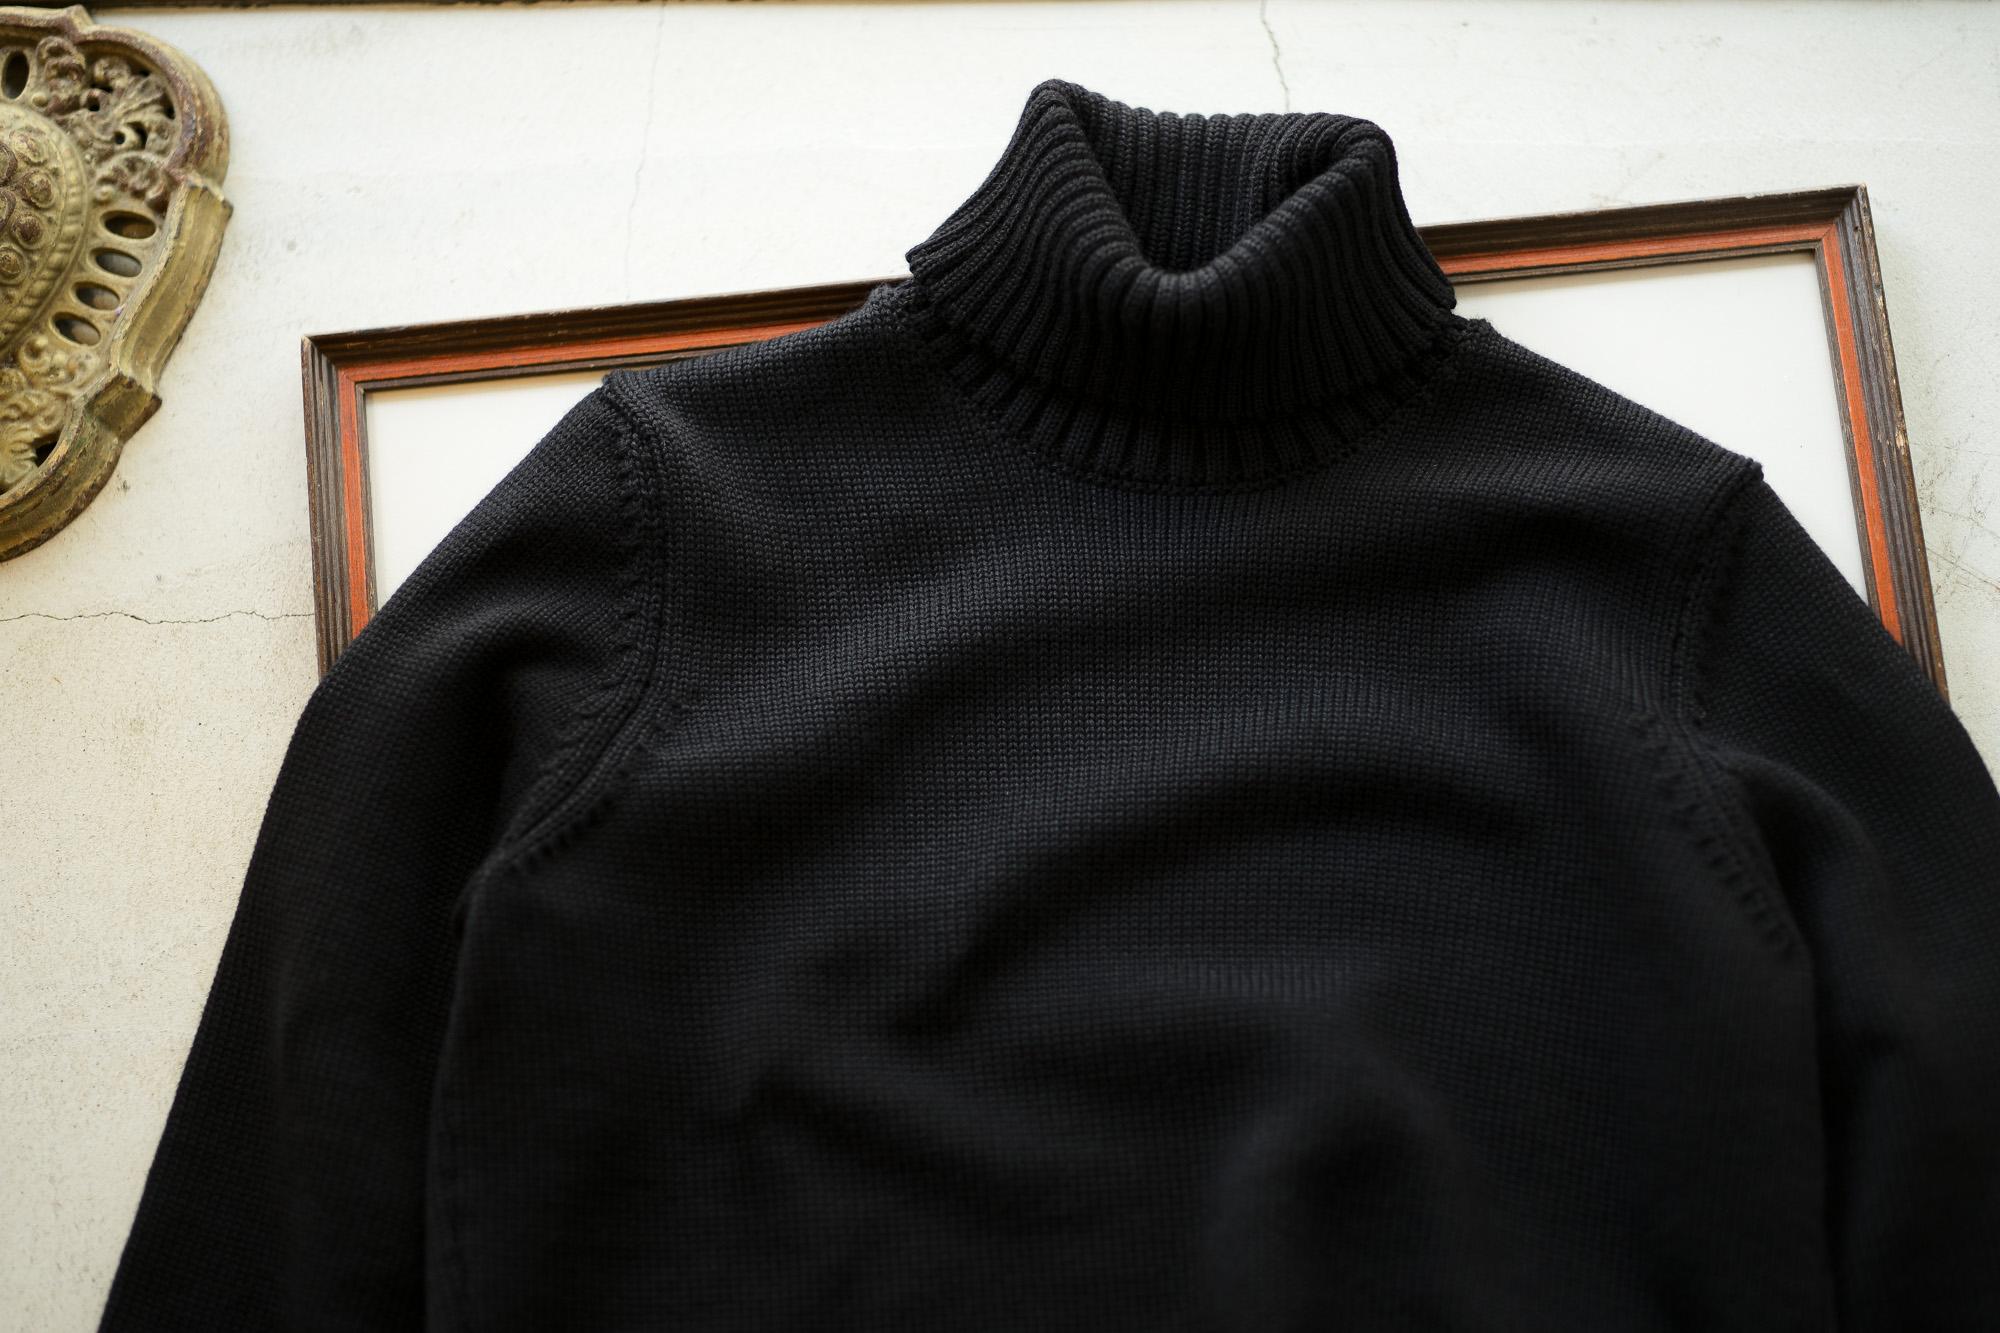 ZANONE (ザノーネ) Turtle Neck Sweater (タートルネックセーター) 810005 Z0229 VIRGIN WOOL 100% ミドルゲージ ウールニット セーター BLACK (ブラック・Z0015) made in italy (イタリア製) 2019 秋冬 【ご予約受付中】 zanone ニット クルーネック 愛知 名古屋 Alto e Diritto アルト エ デリット